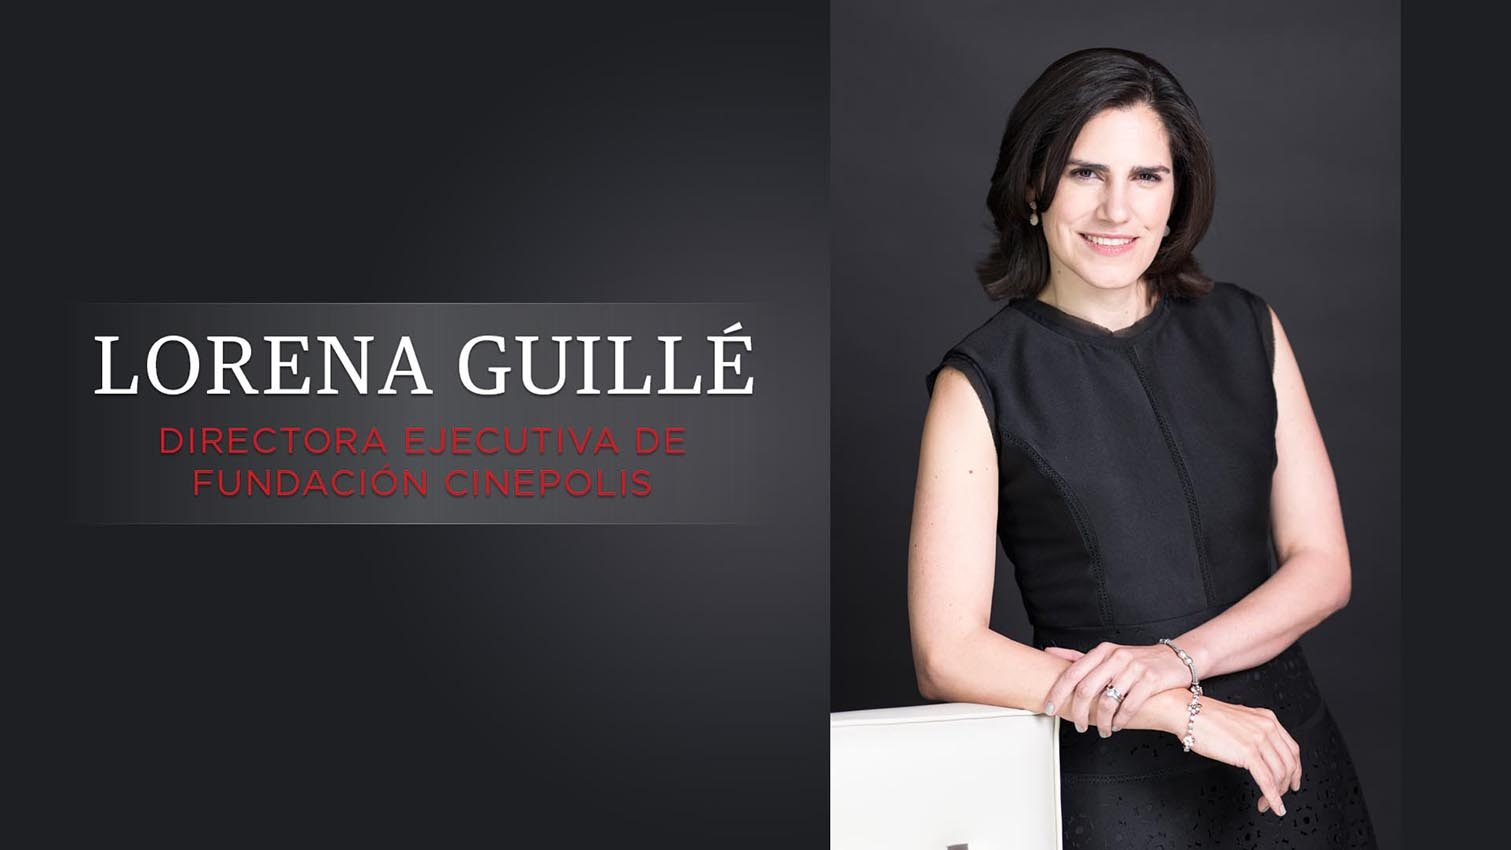 Mujeres Poderosas 2015. Lorena Guillé, directora ejecutiva de Fundación Cinépolis